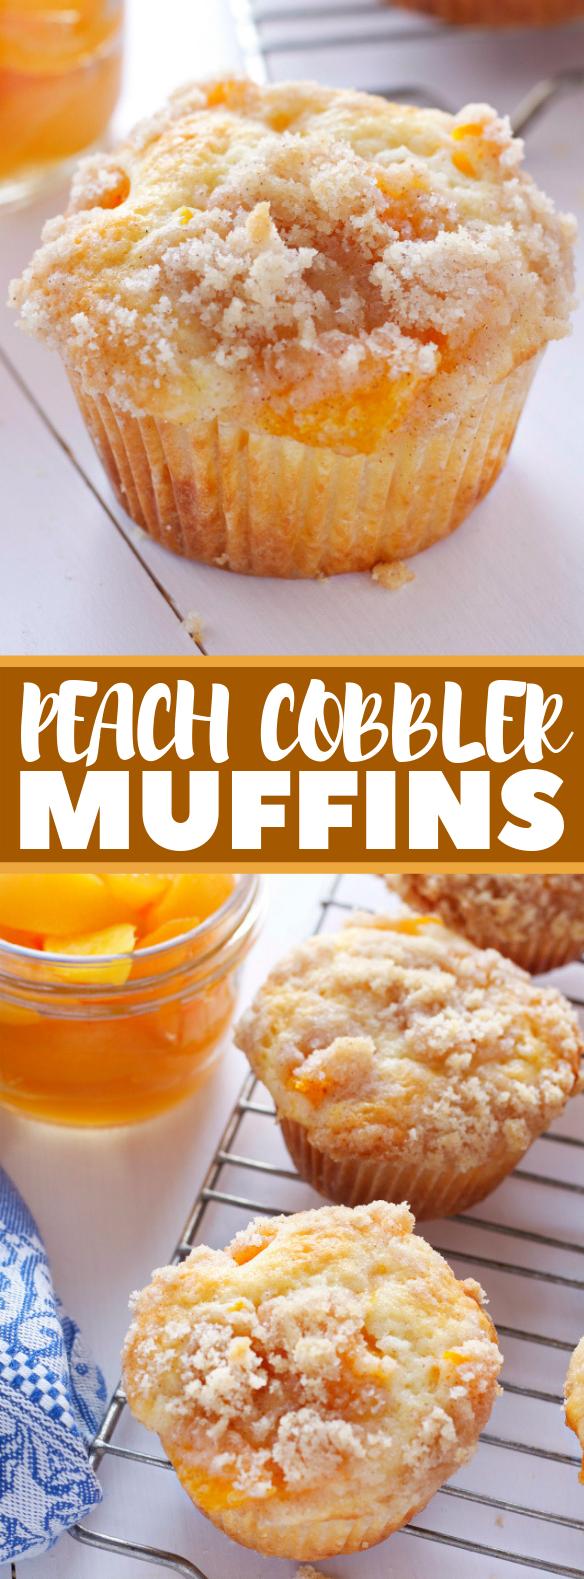 PEACH COBBLER MUFFINS #cupcake #dessert